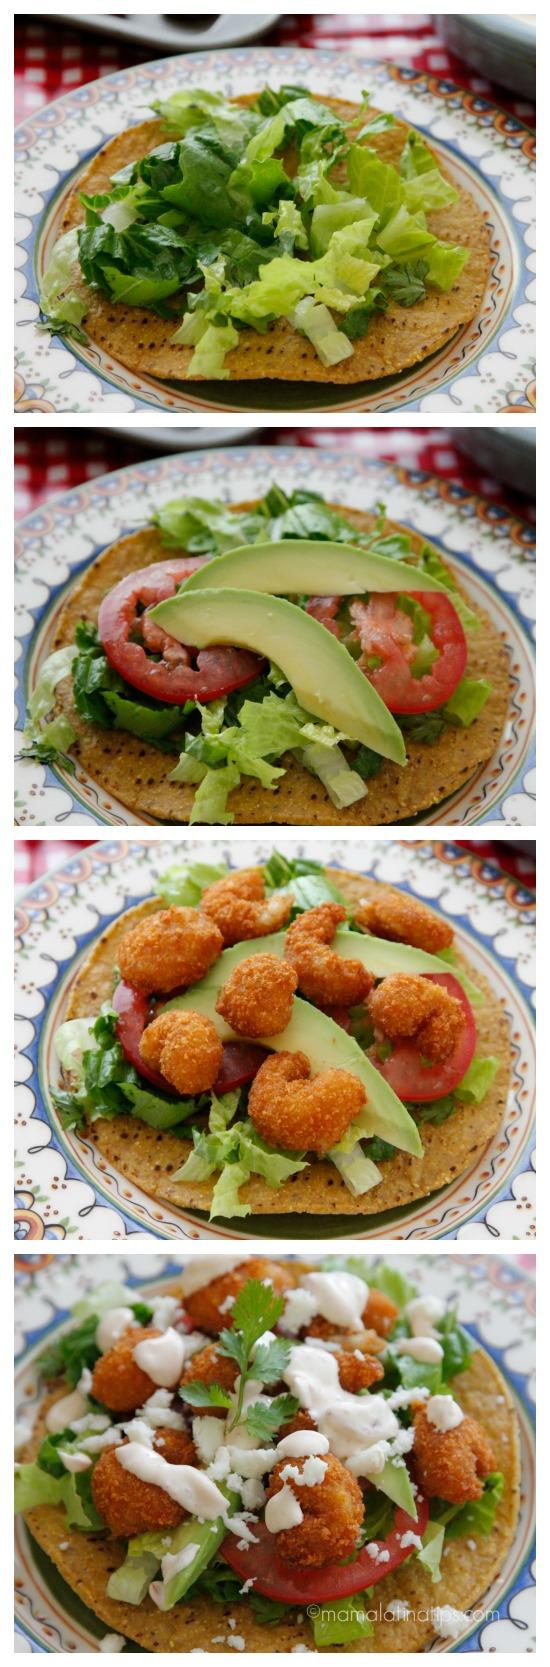 Shrimp tostada with chipotle cream layers - mamalatinatips.com